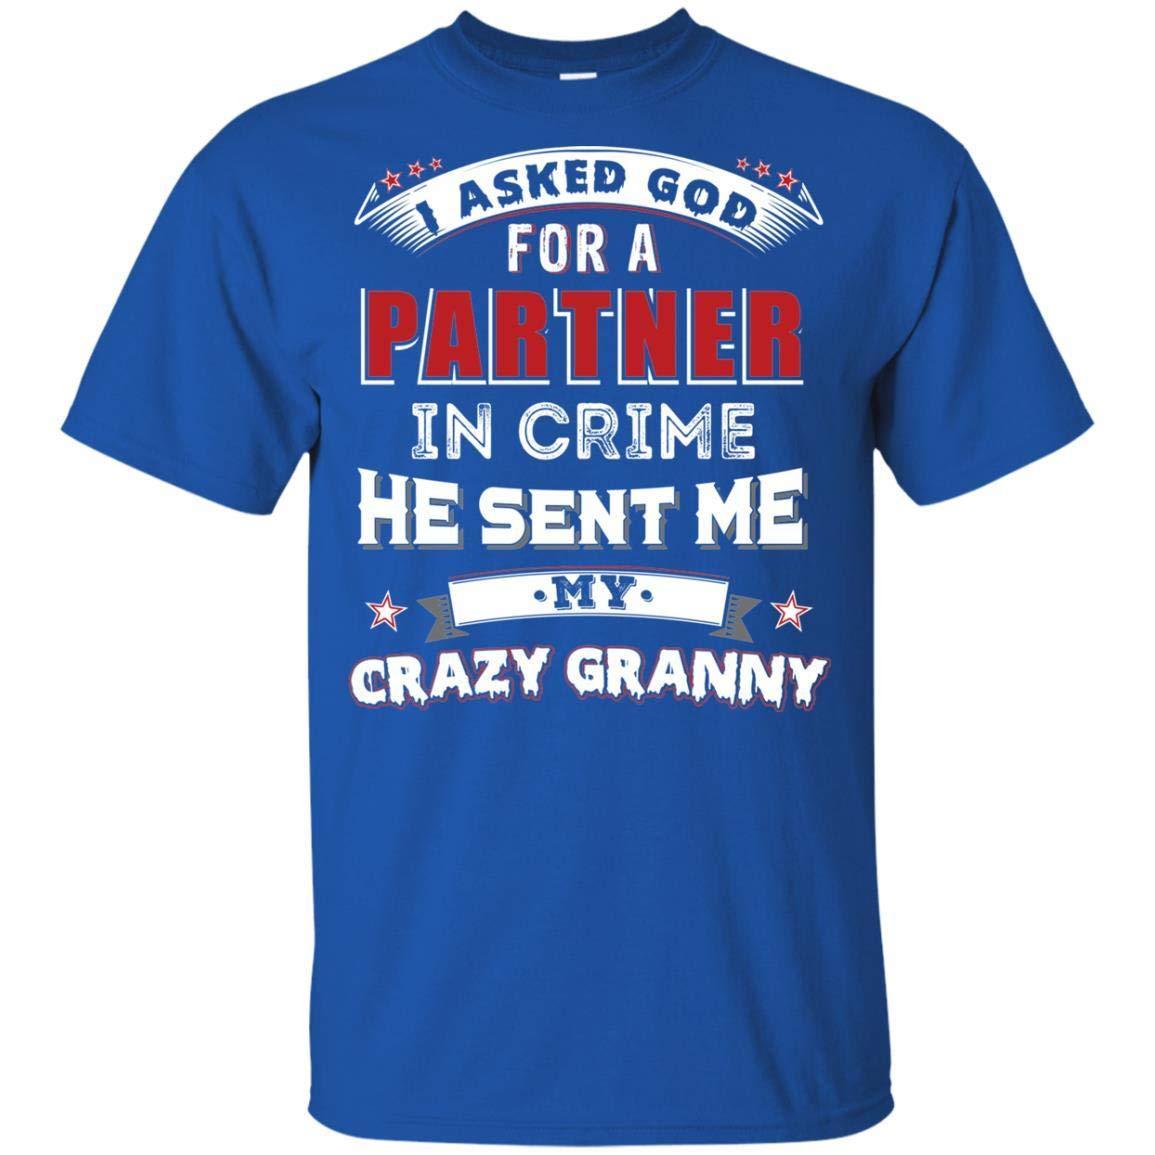 KeyVic I Asked God for A Partner in Crime He Sent Me My Crazy Granny Kid T-Shirt